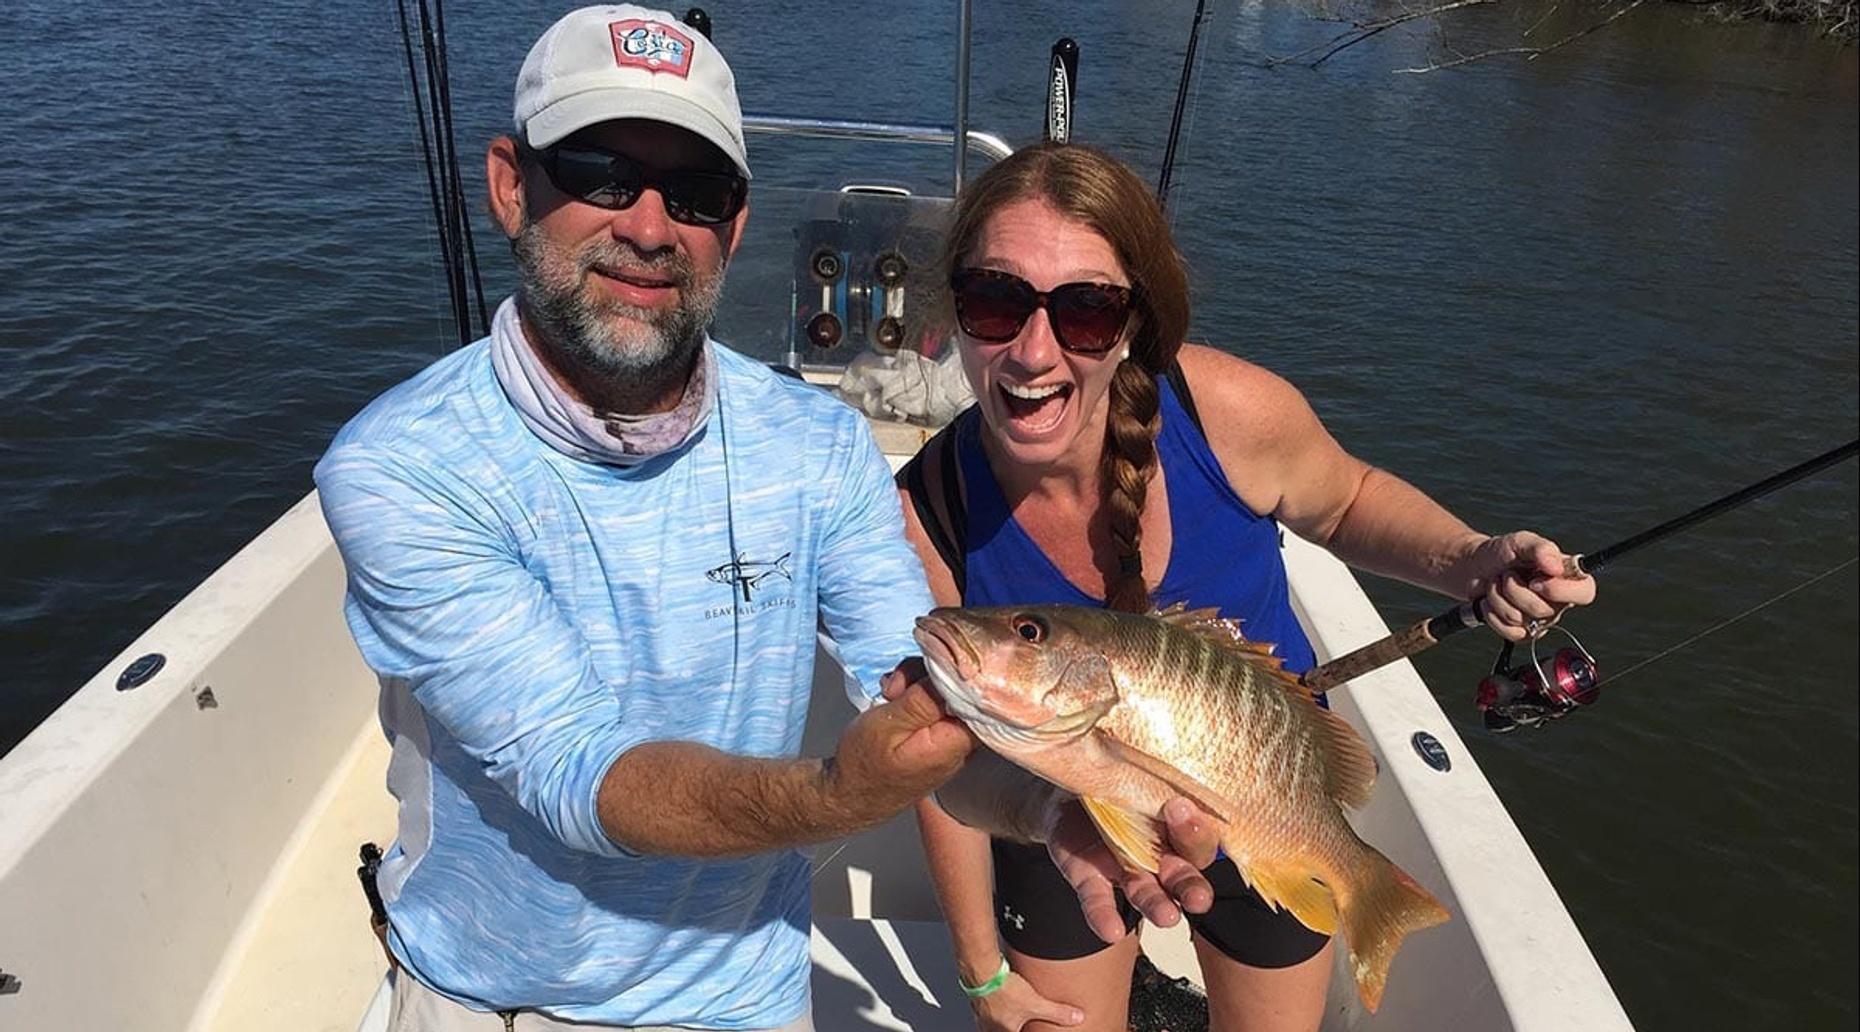 Half-Day Nearshore Fishing Charter in Naples